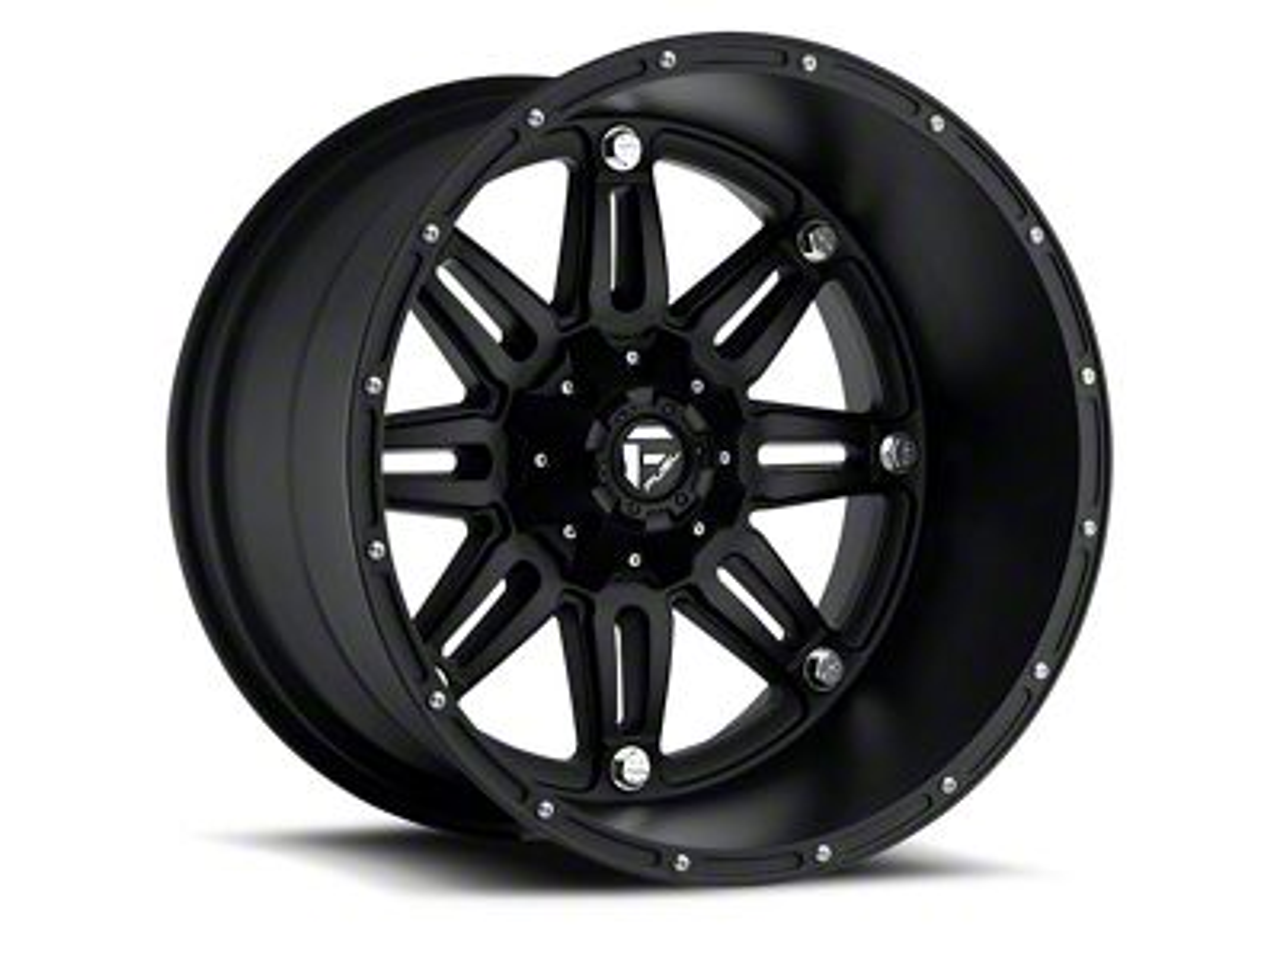 Fuel Wheels Hostage Matte Black 6-Lug Wheel - 20x9 (99-18 Silverado 1500)